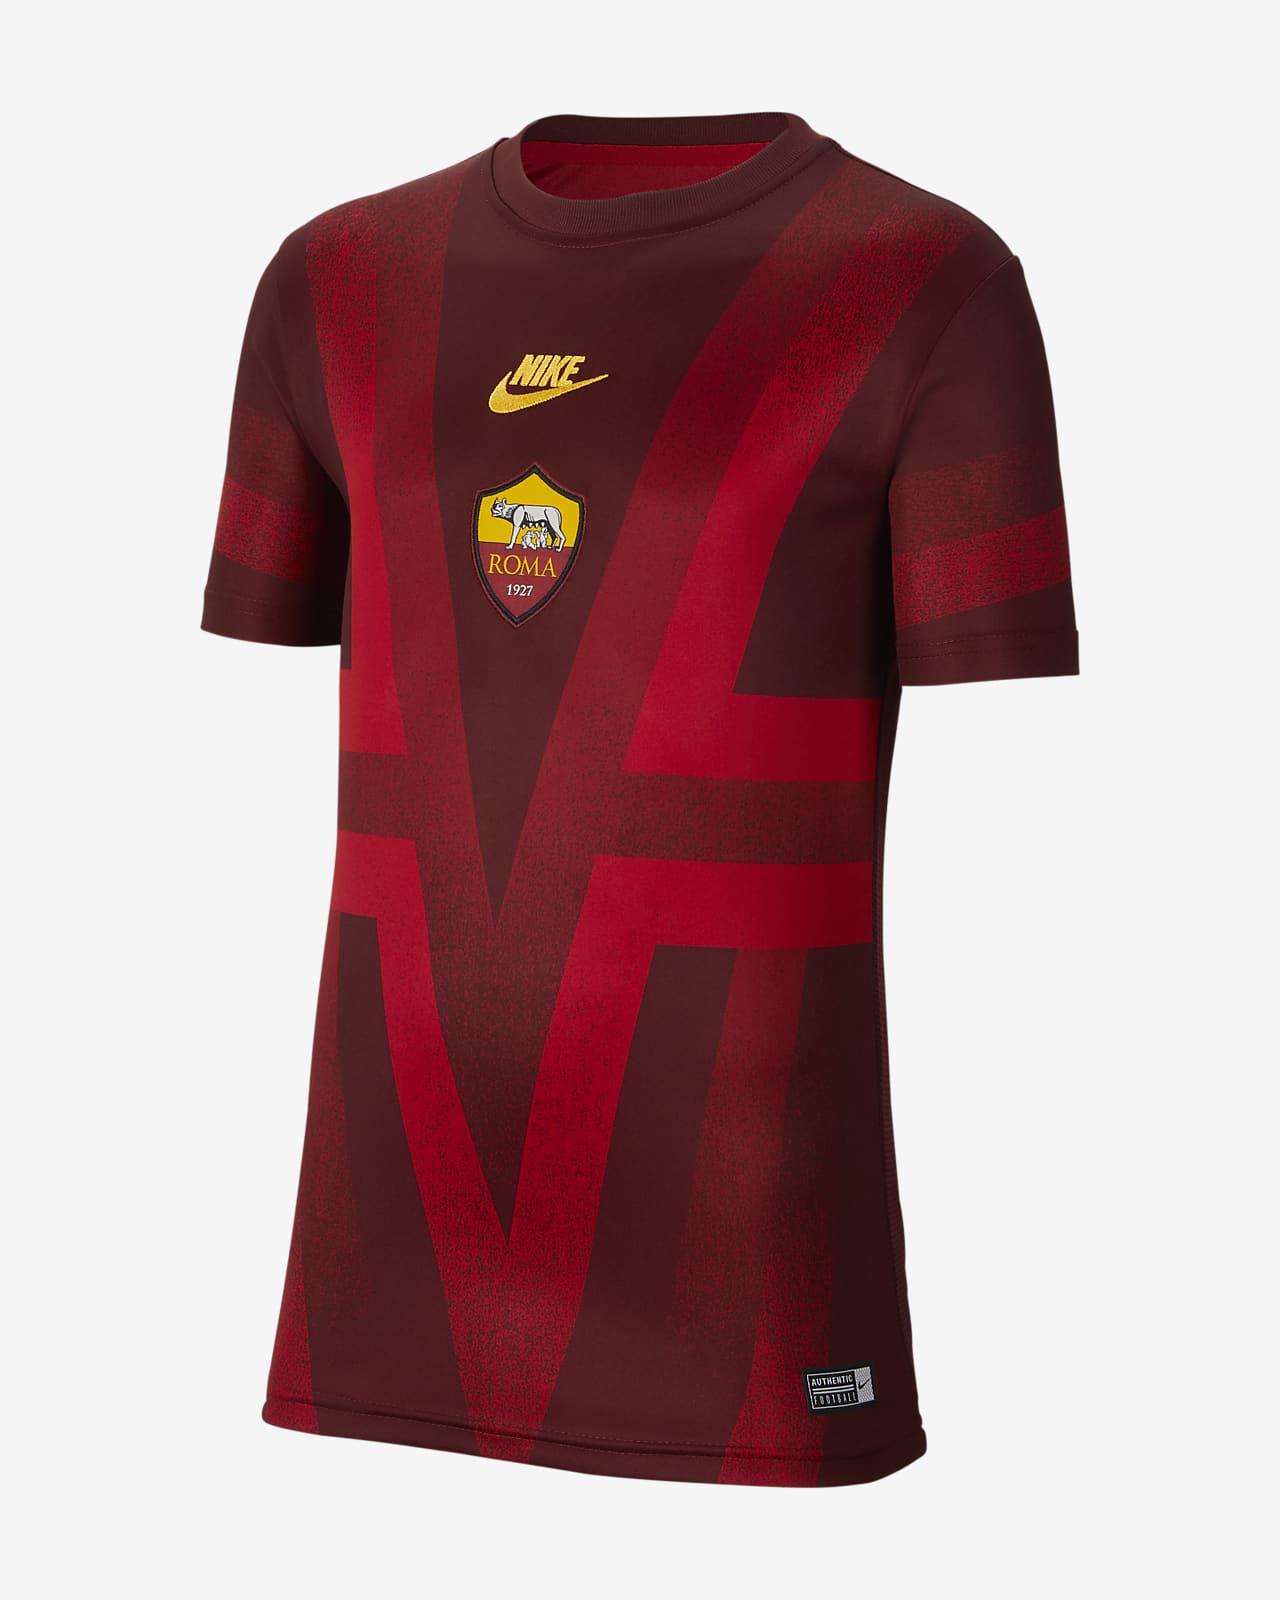 A.S. Roma Older Kids' Short-Sleeve Football Top